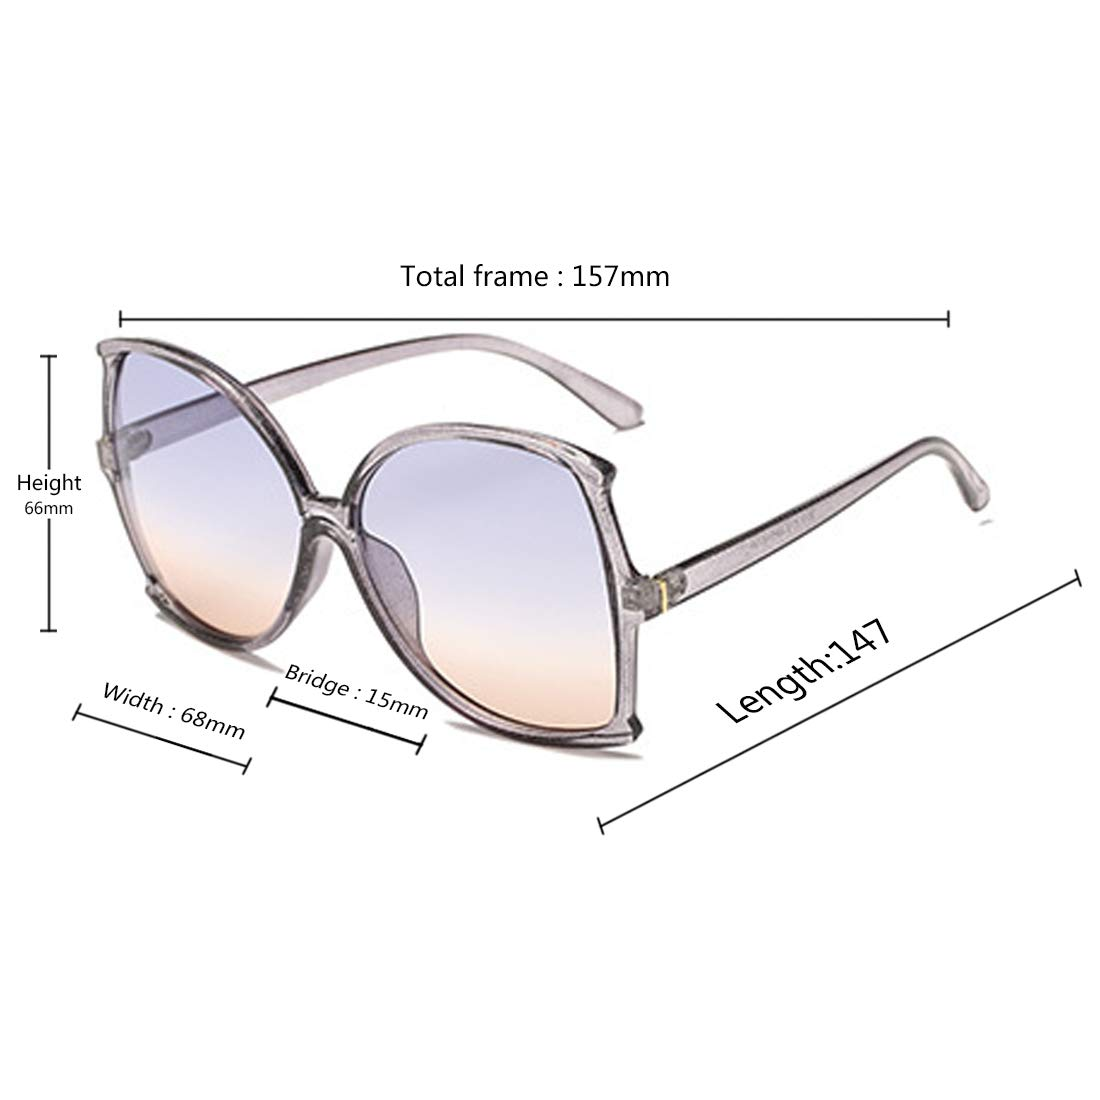 Fulision women fashion Simple sunglasses Retro glasses Men and women Sunglasses